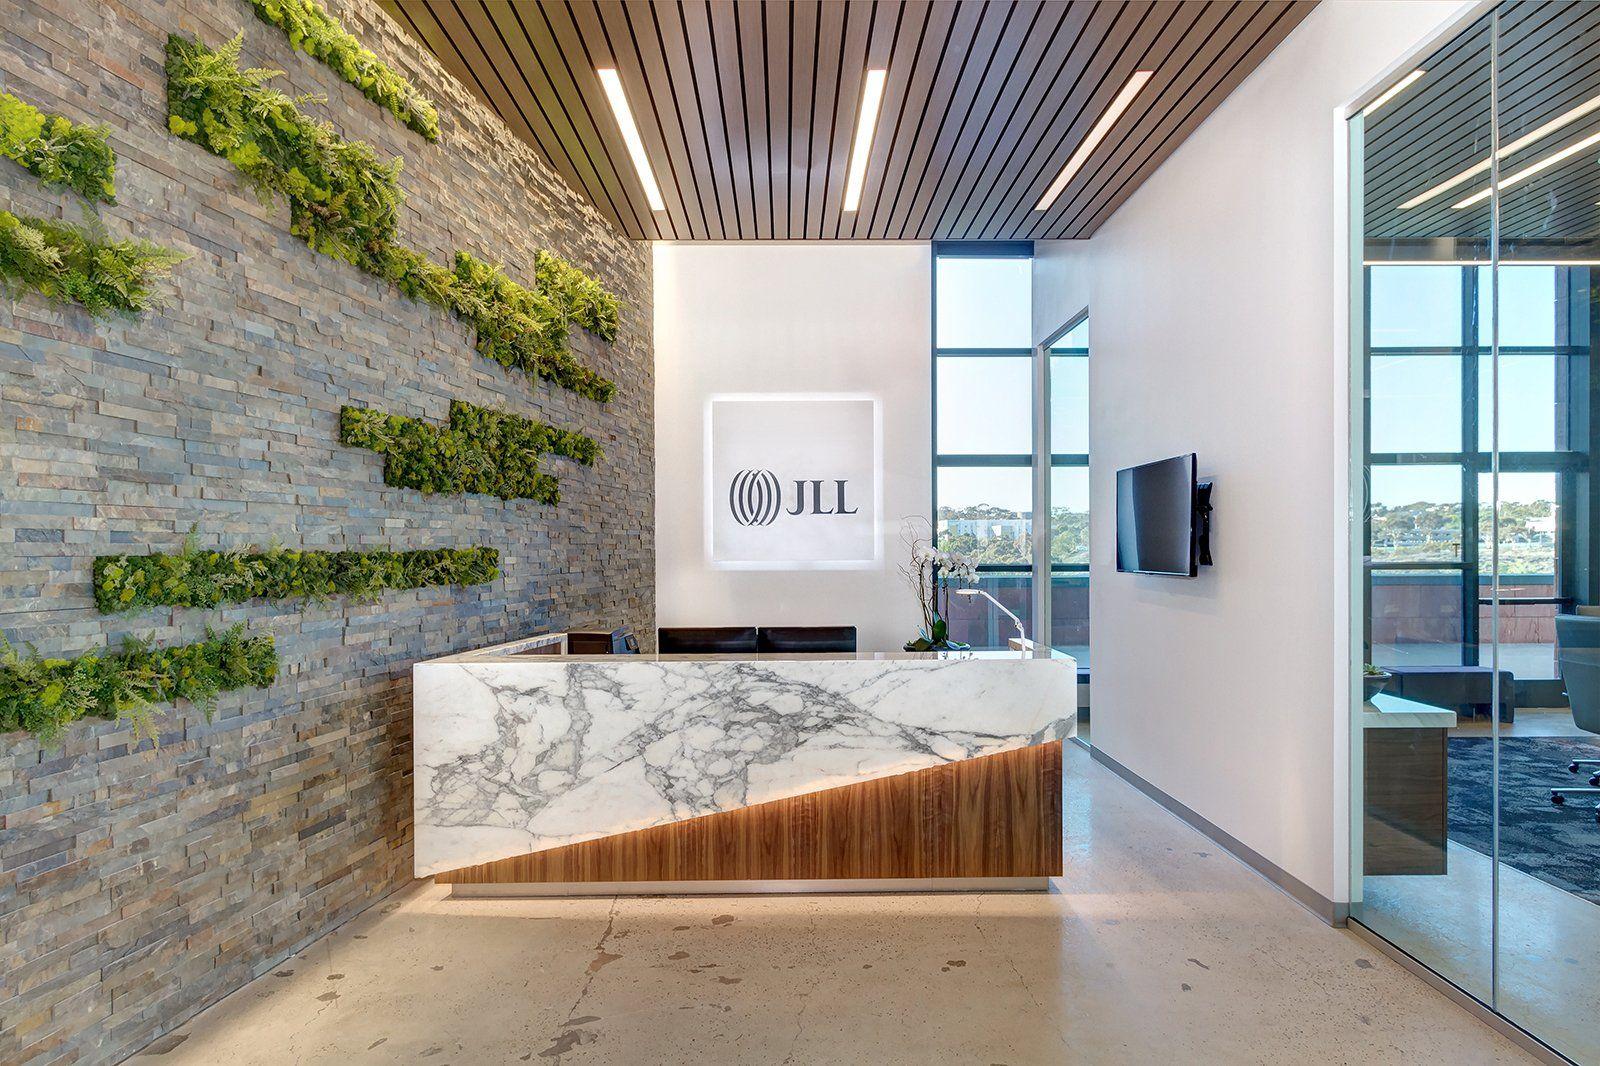 Office Tour Jll Offices La Jolla Office Reception Design